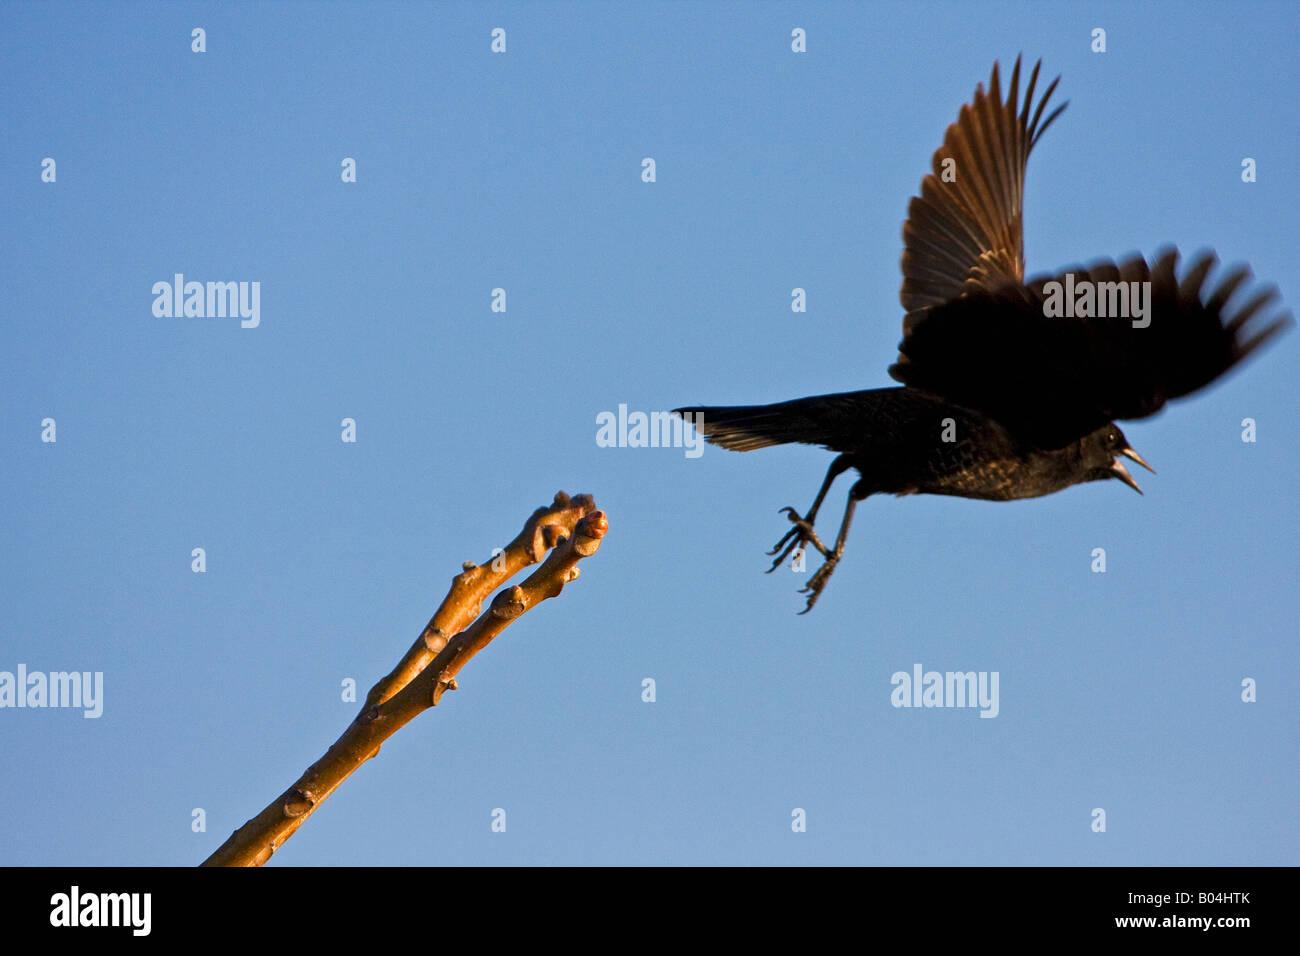 Blackbird taking a leap of faith - Stock Image